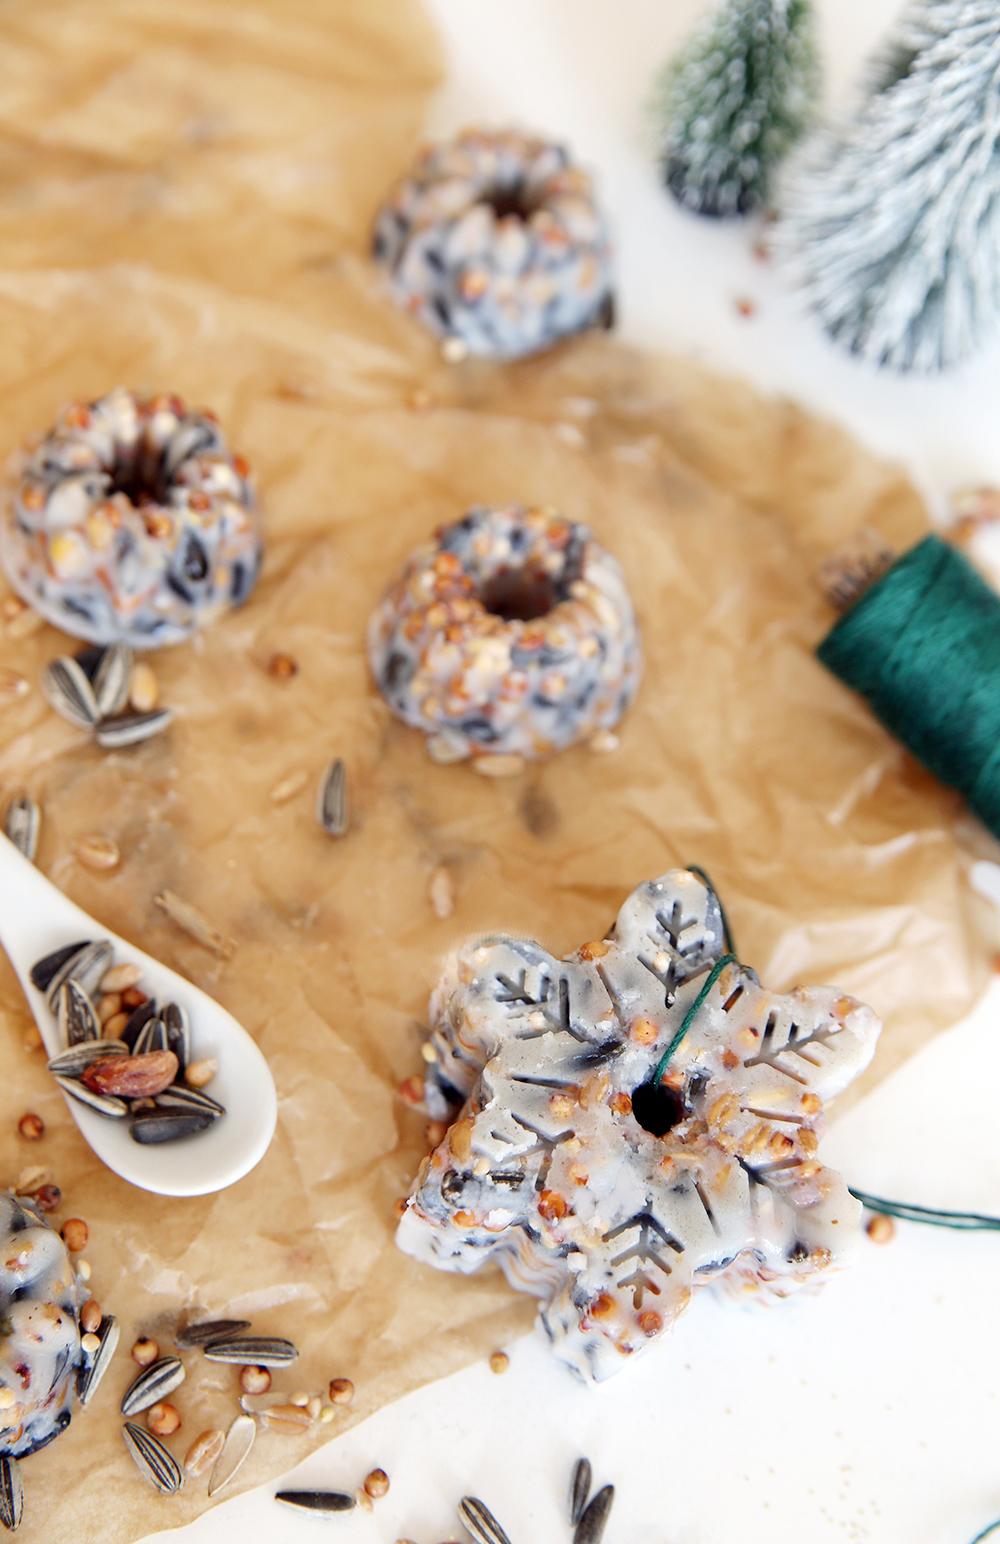 Kreative DIY-Idee: Vögel füttern im Winter